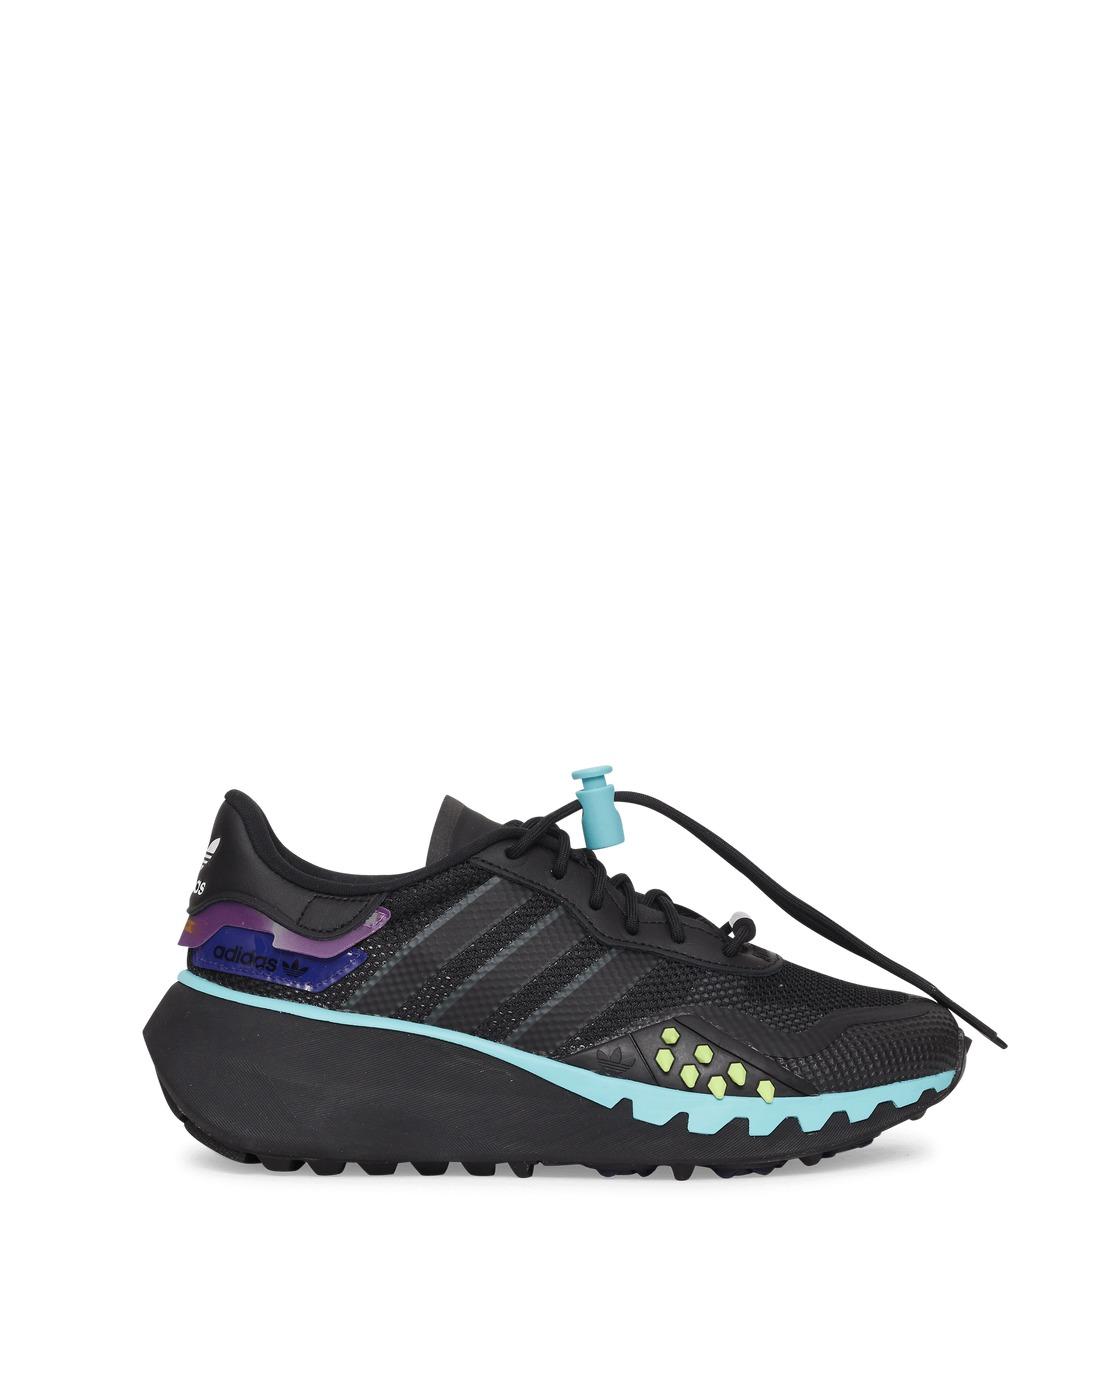 Adidas Originals Choigo Sneakers Core Black/Core Black